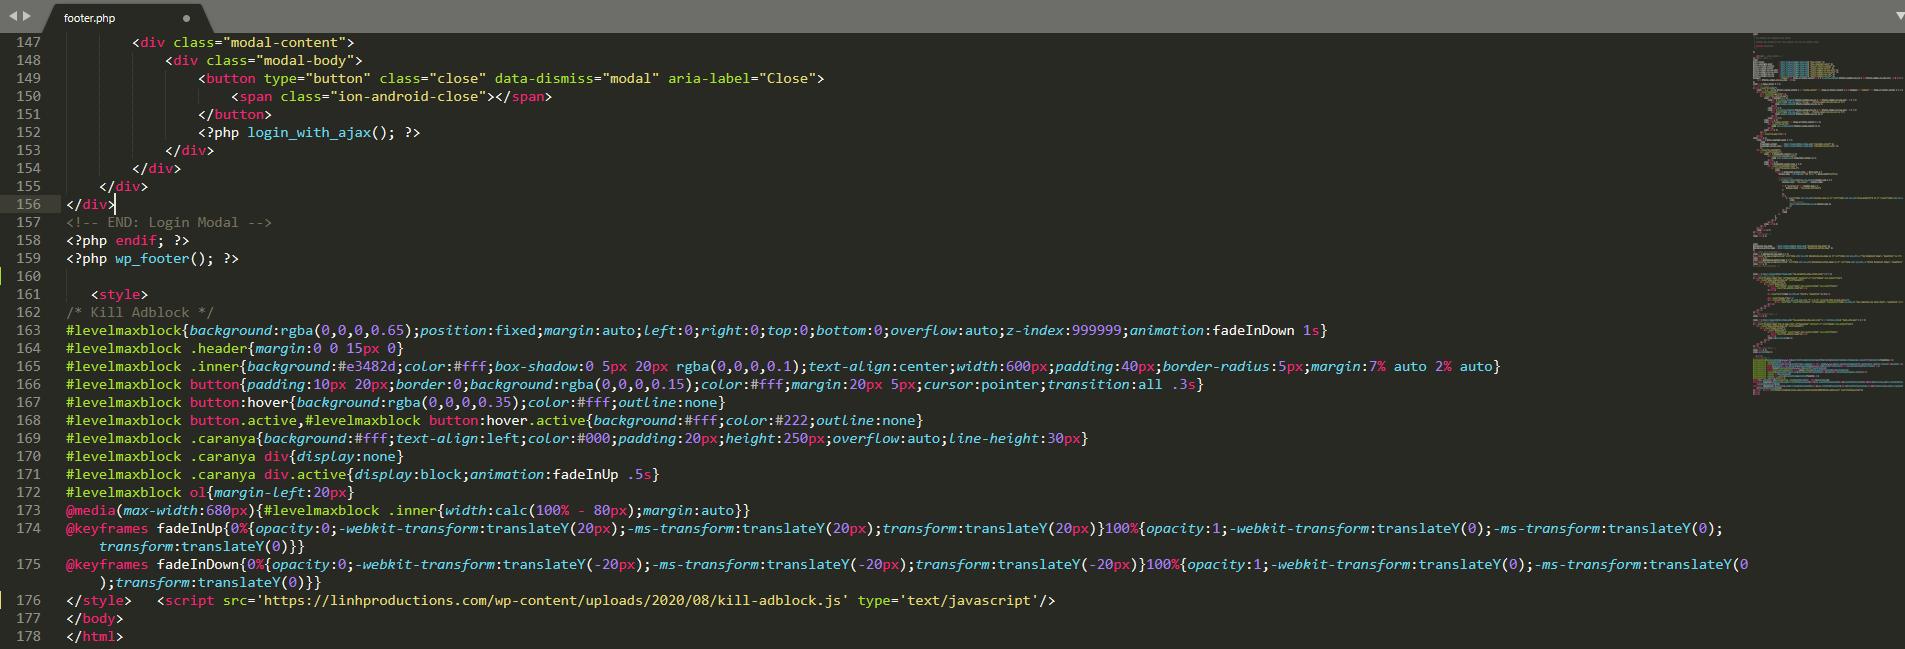 code tat adblock cho wordpress 1